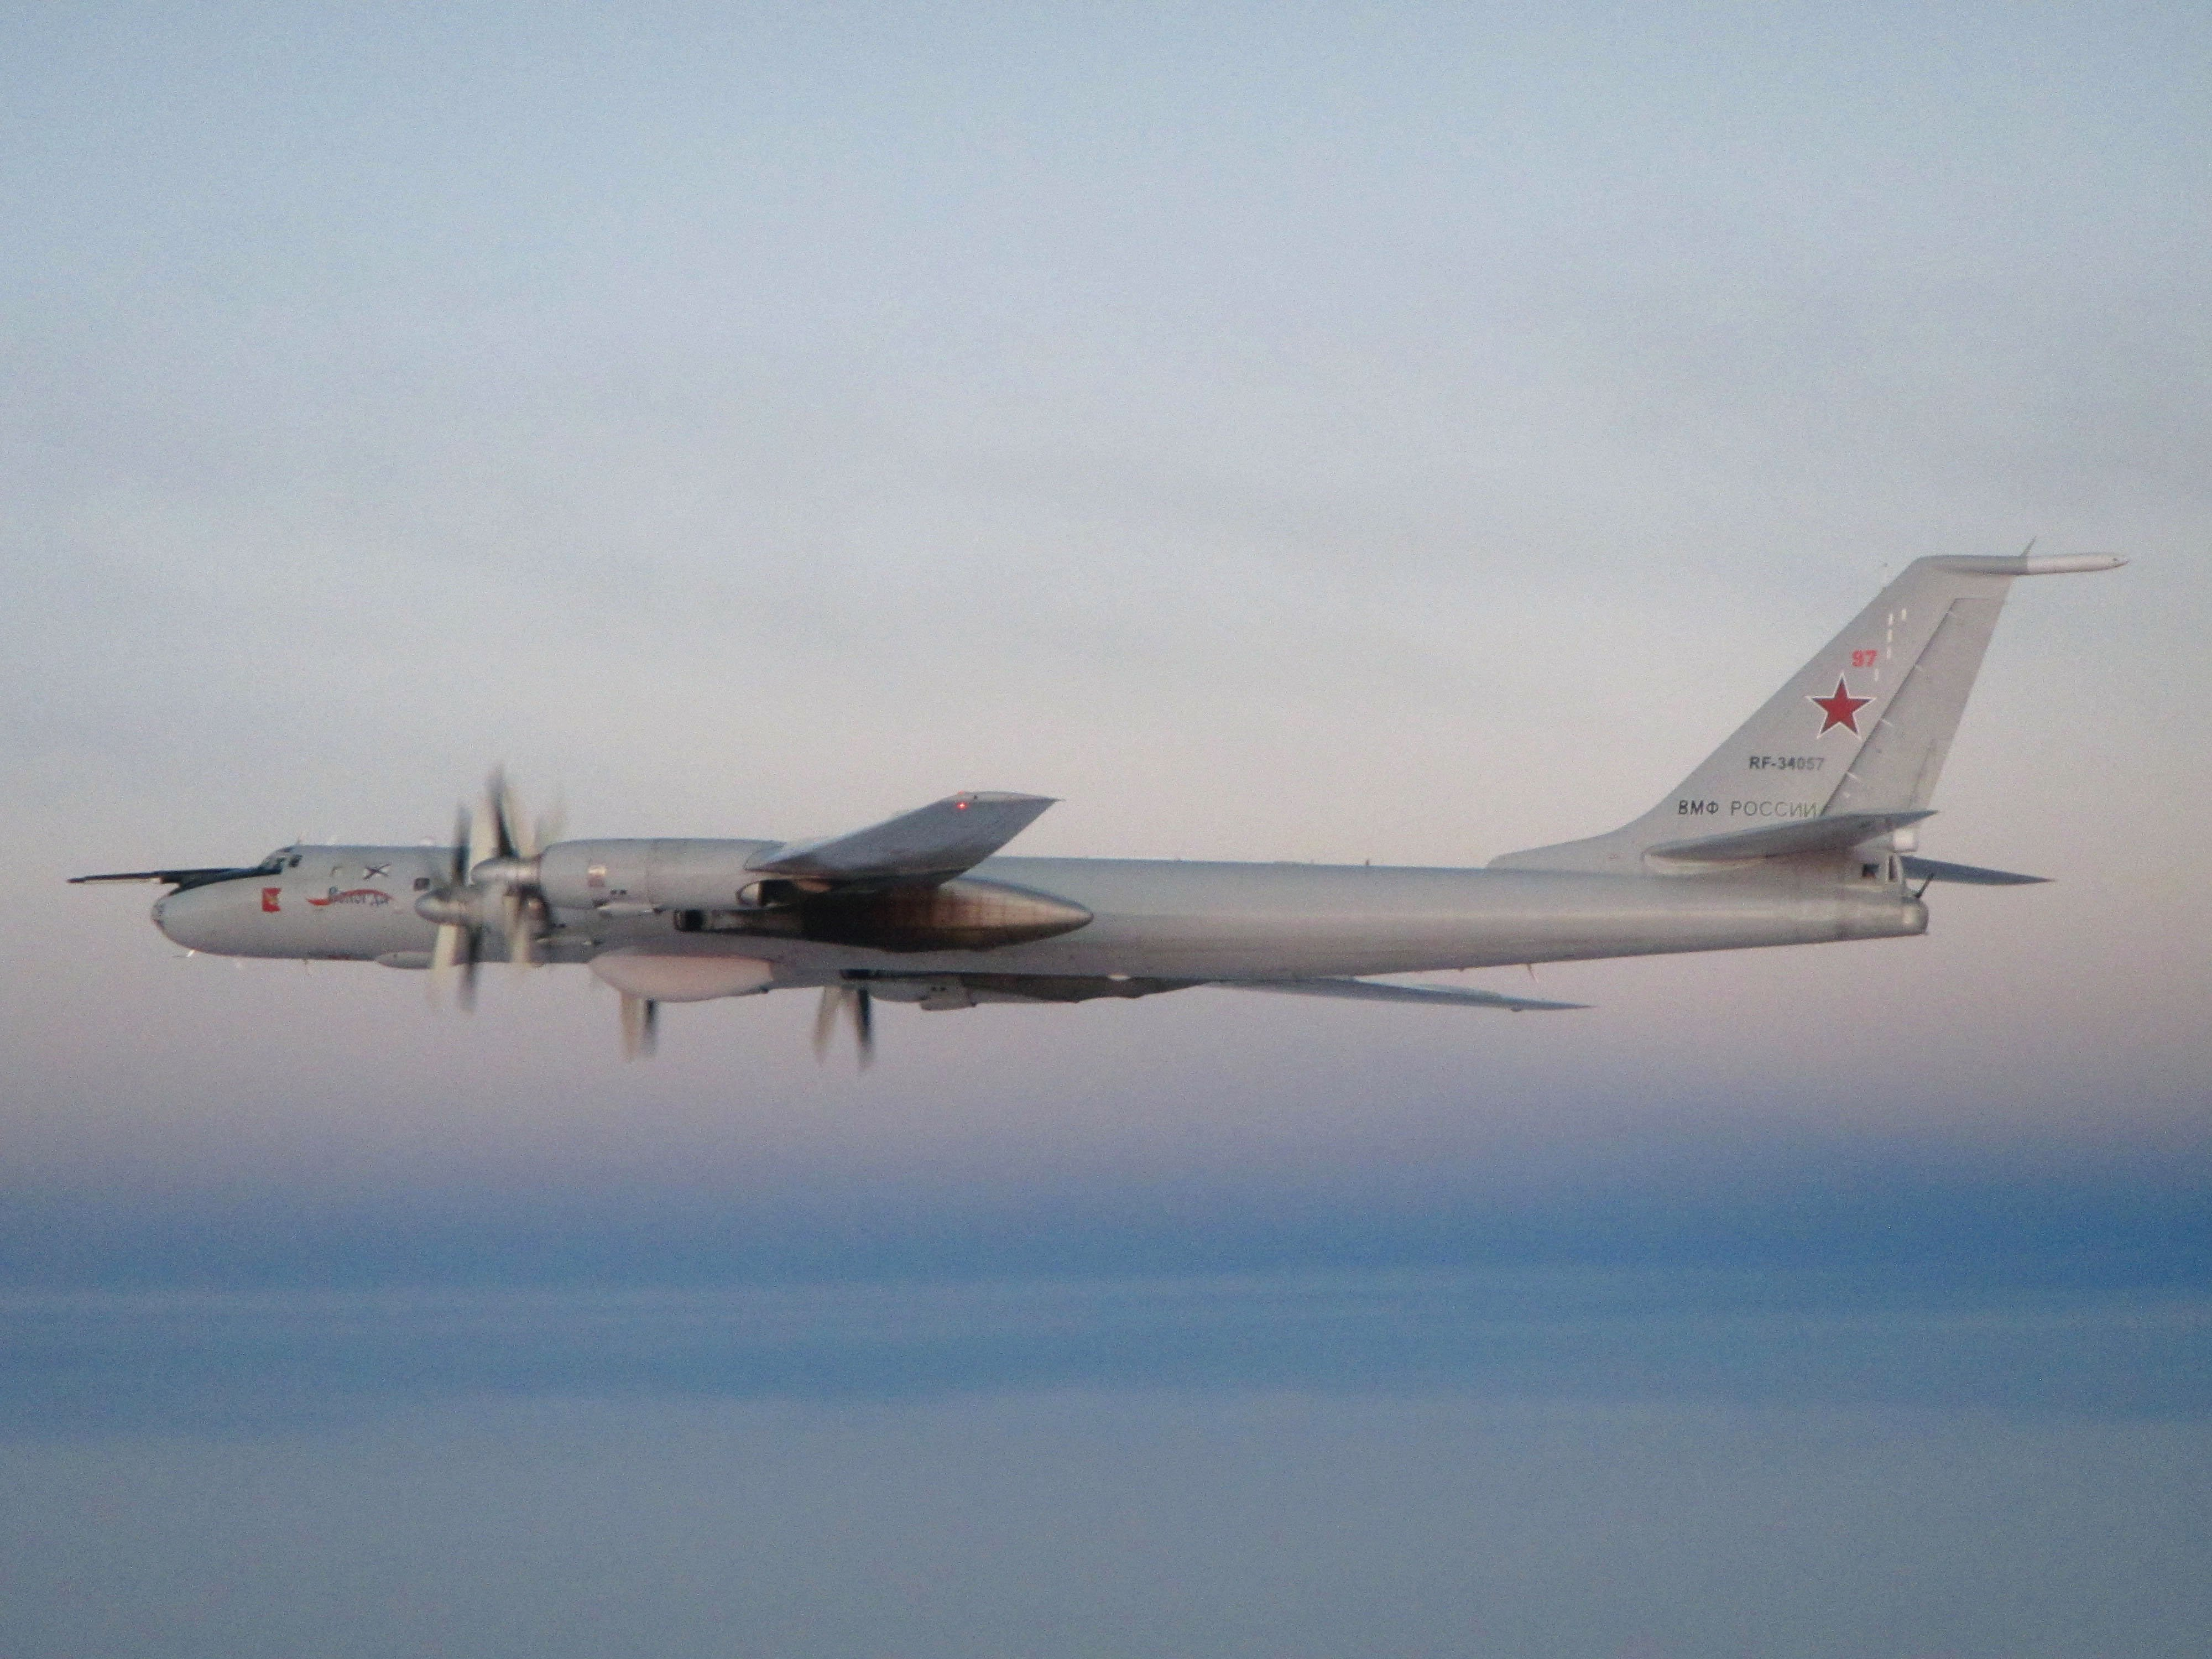 Russian Navy Tu-142 [MoD Crown Copyright]